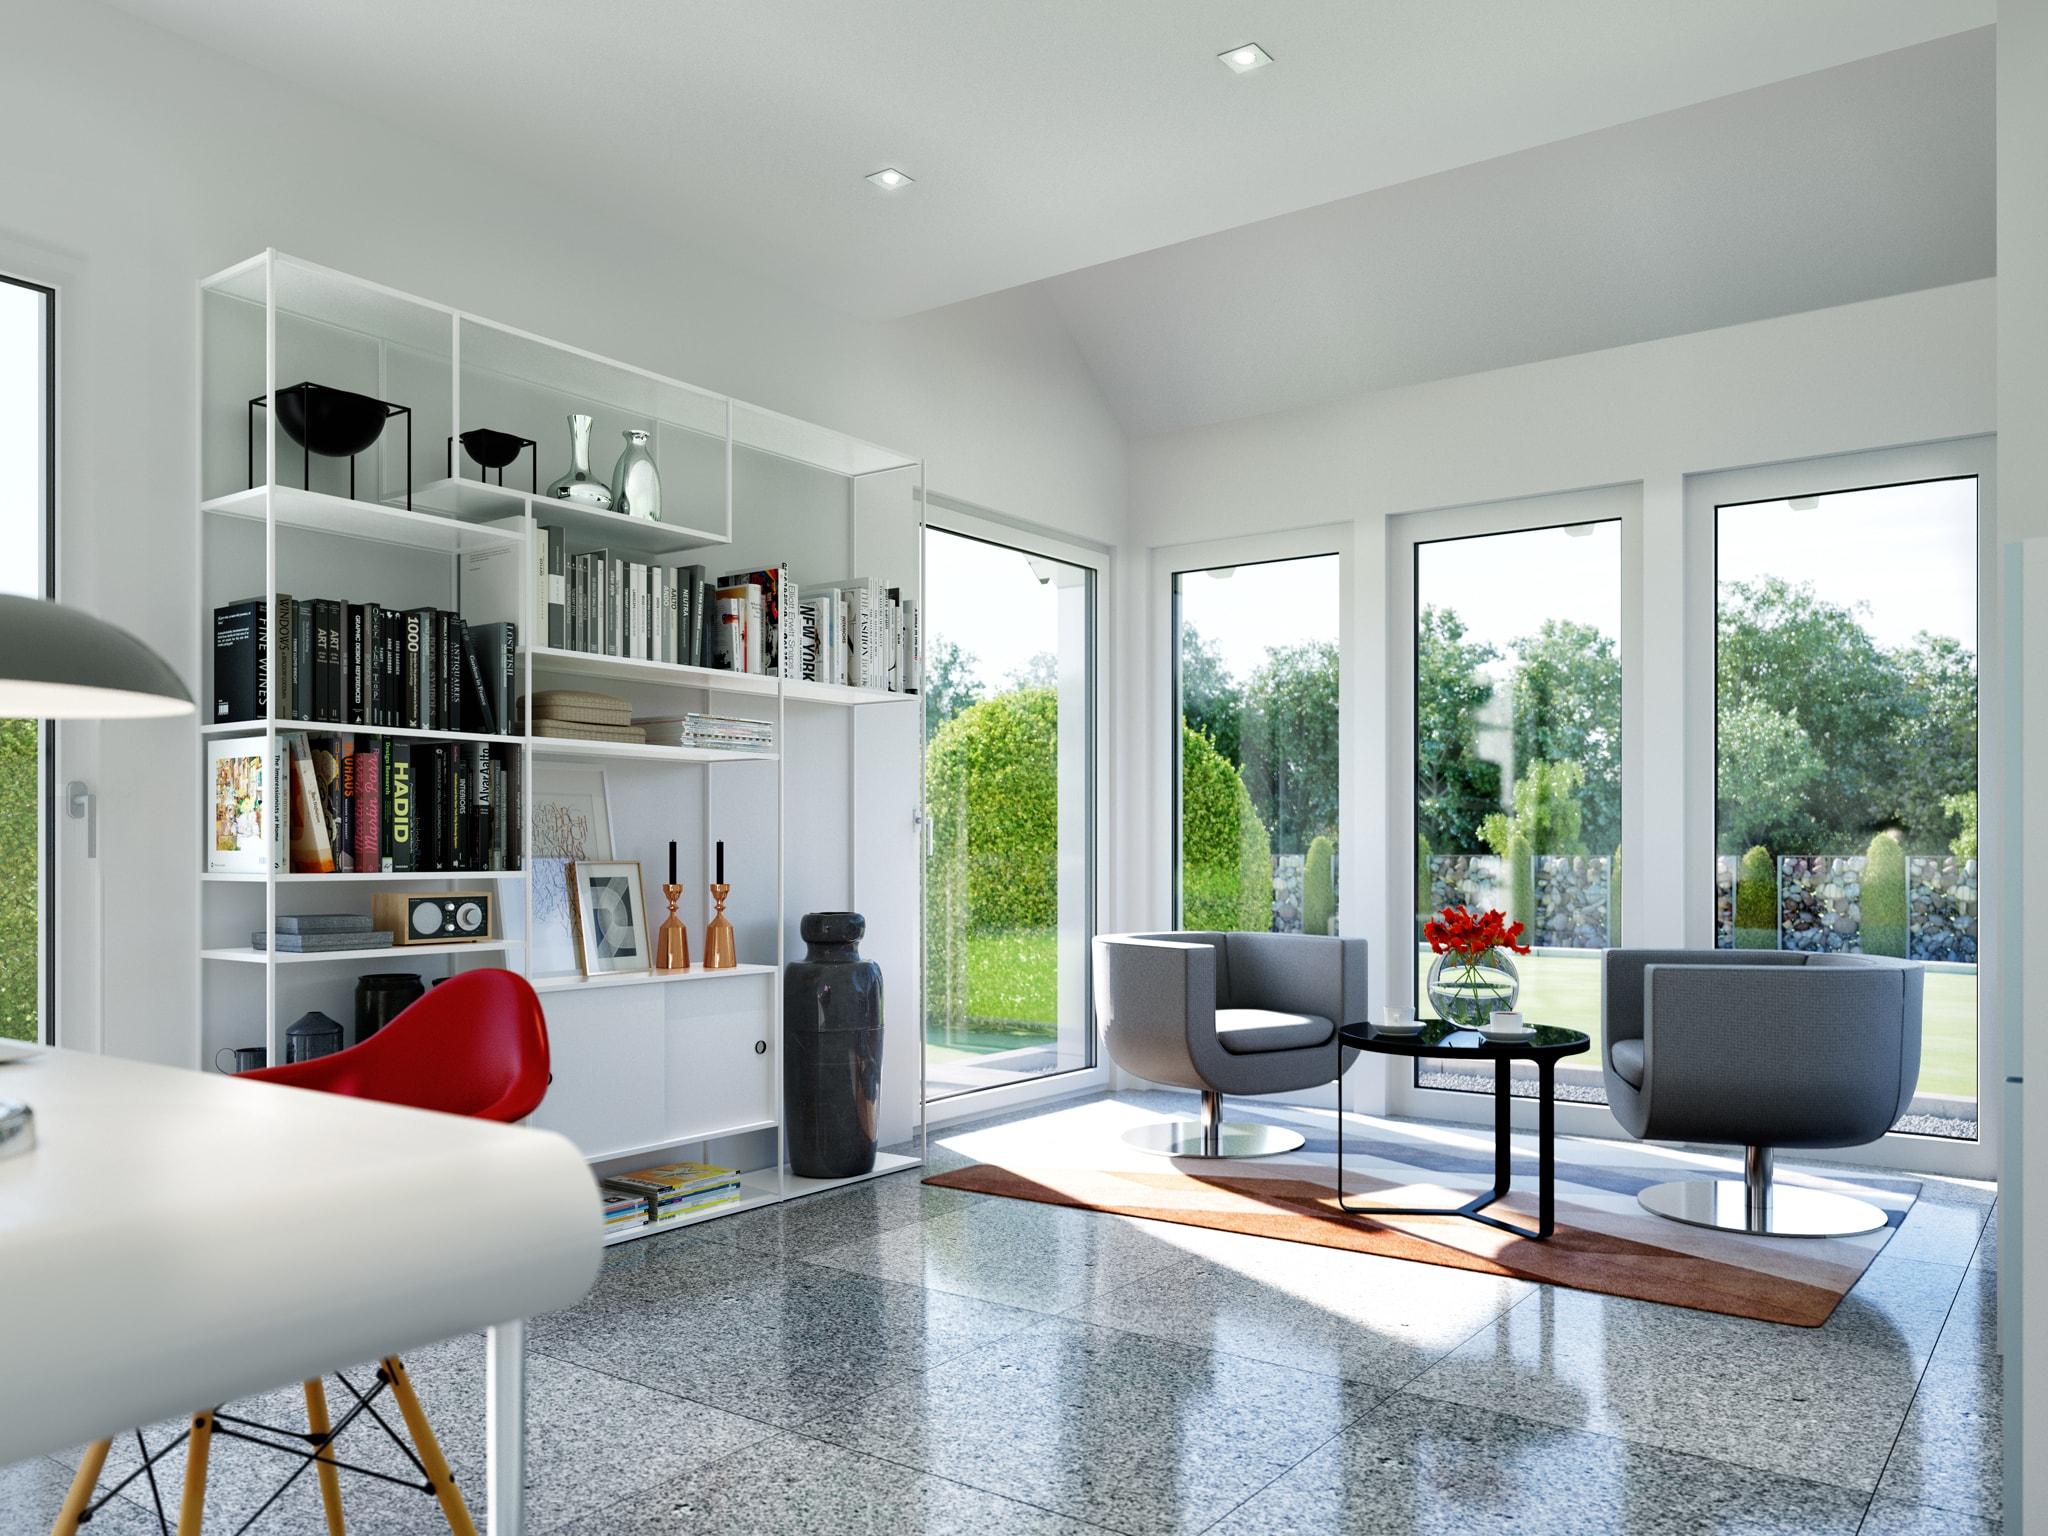 Arbeitszimmer Ideen - Einfamilienhaus Inneneinrichtung Fertighaus Living Haus SUNSHINE 143 V3 - HausbauDirekt.de